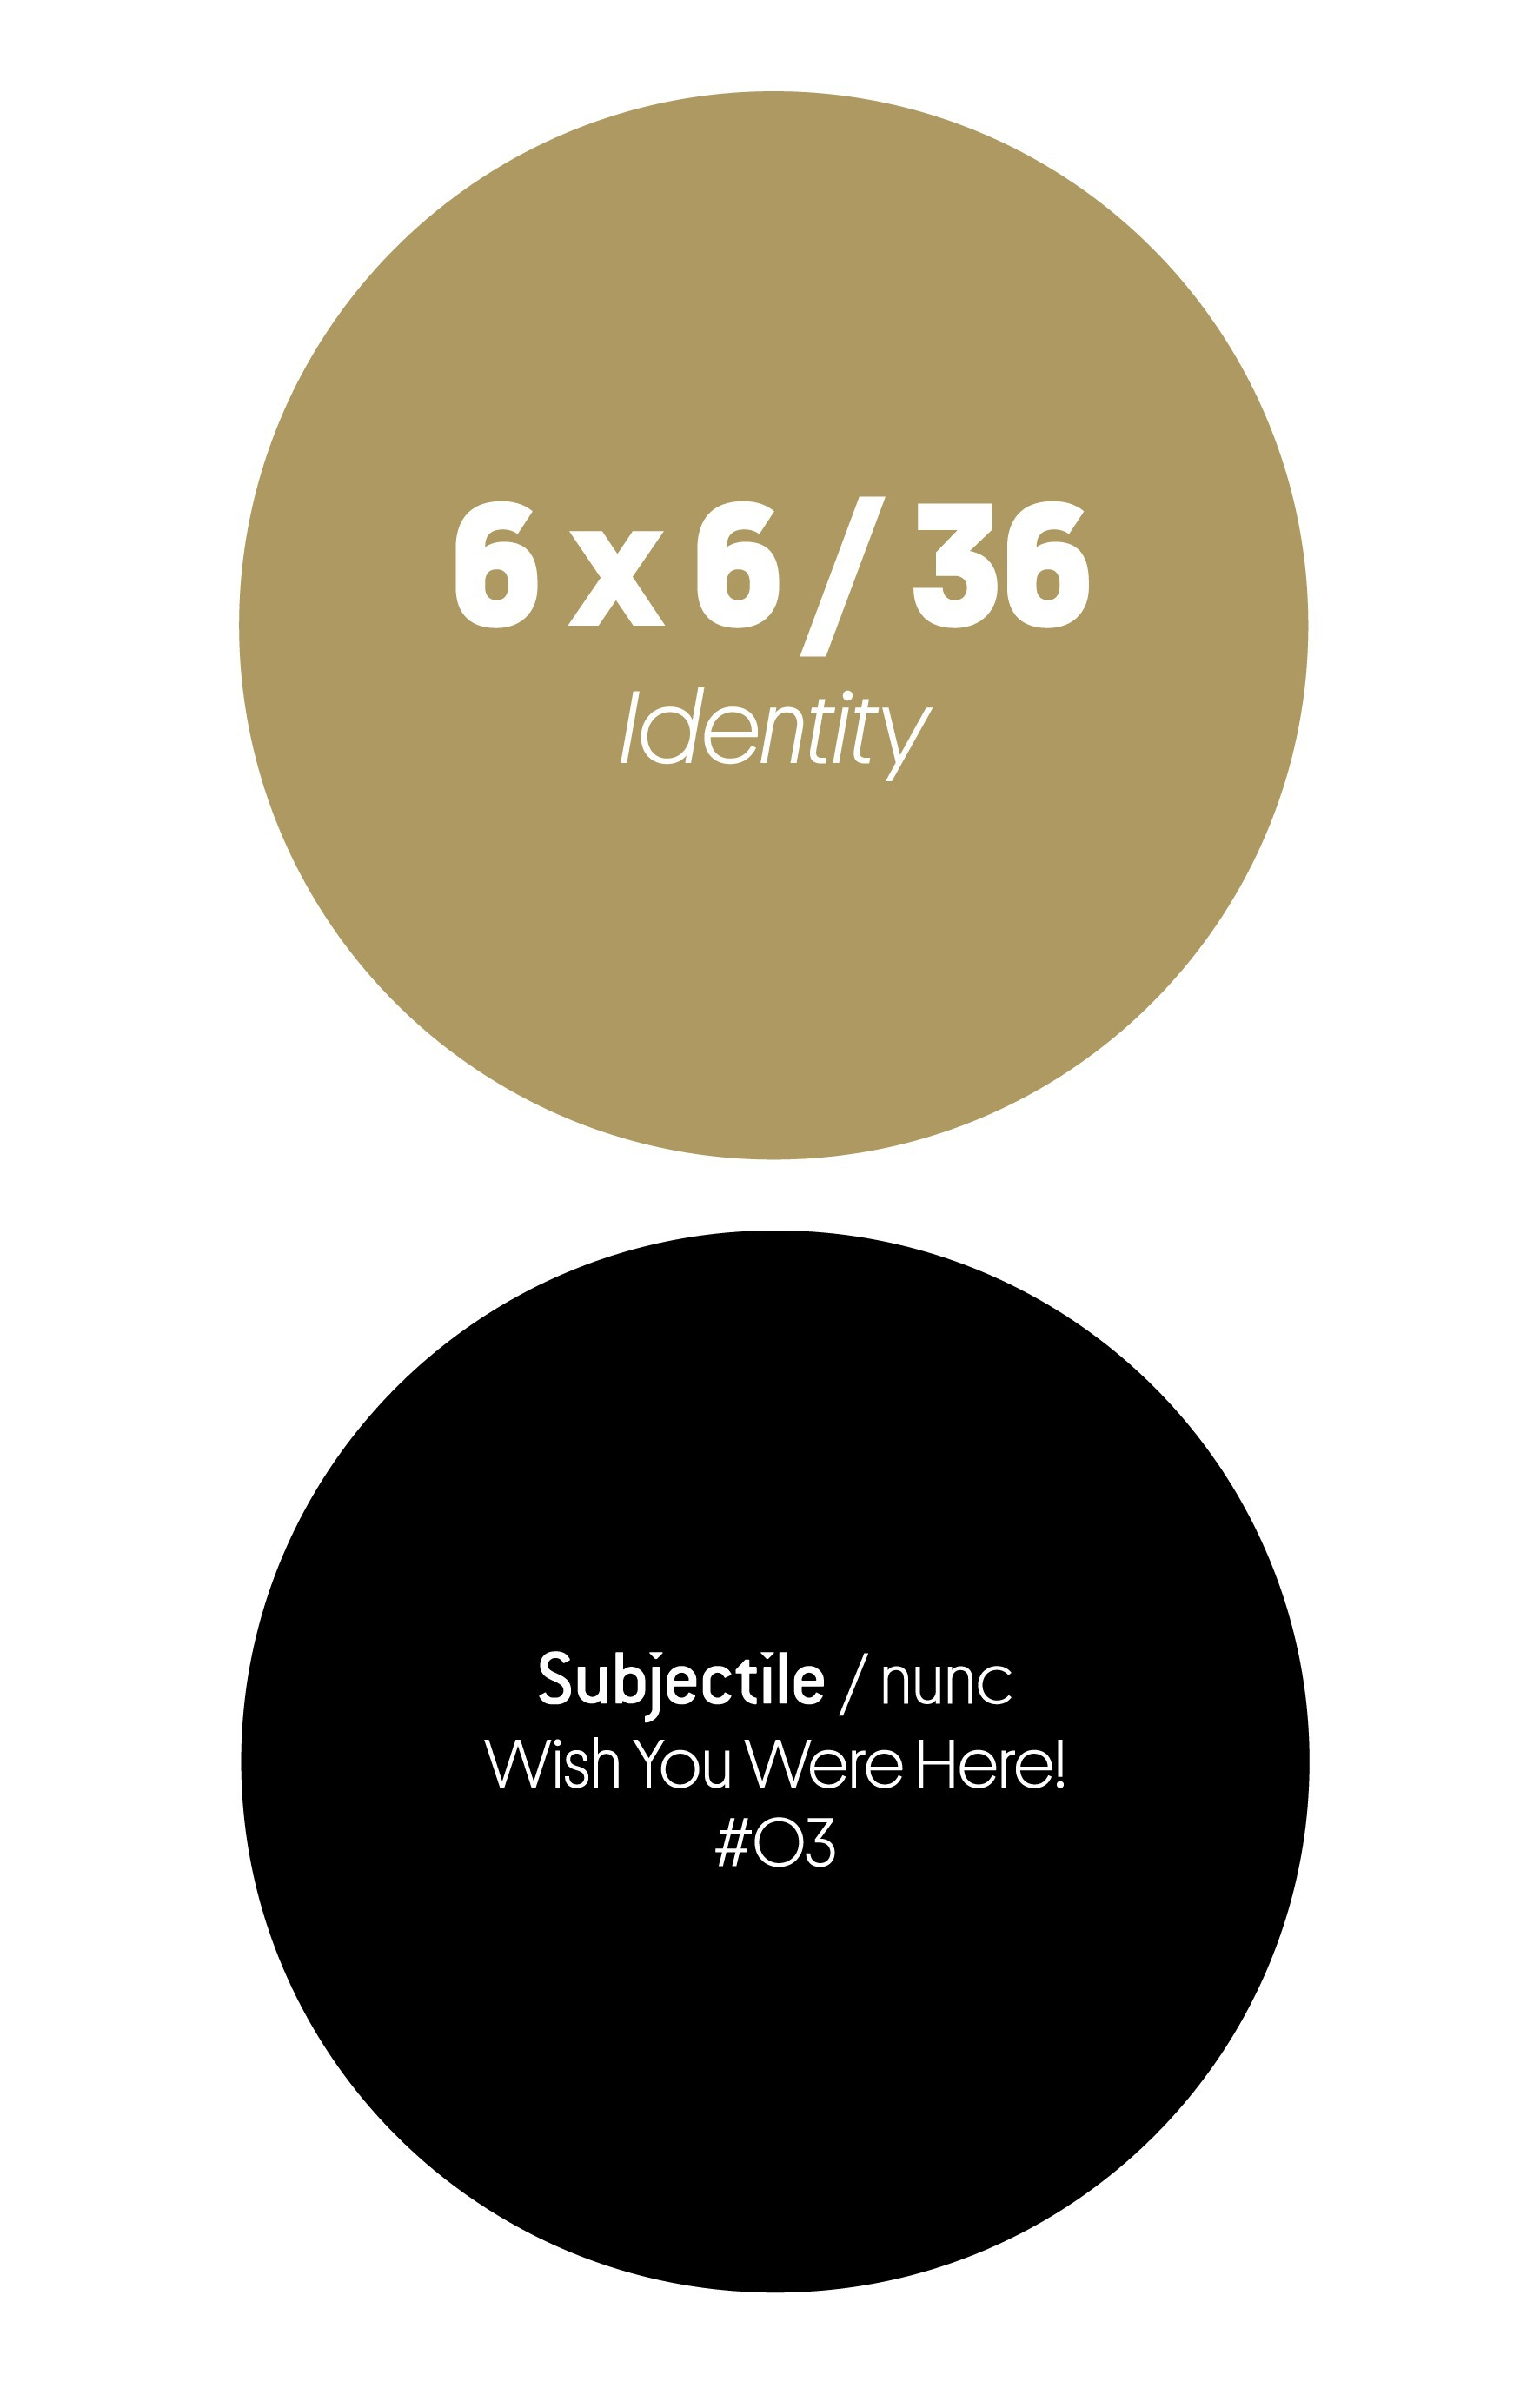 6 x 6 / 36 ; identity